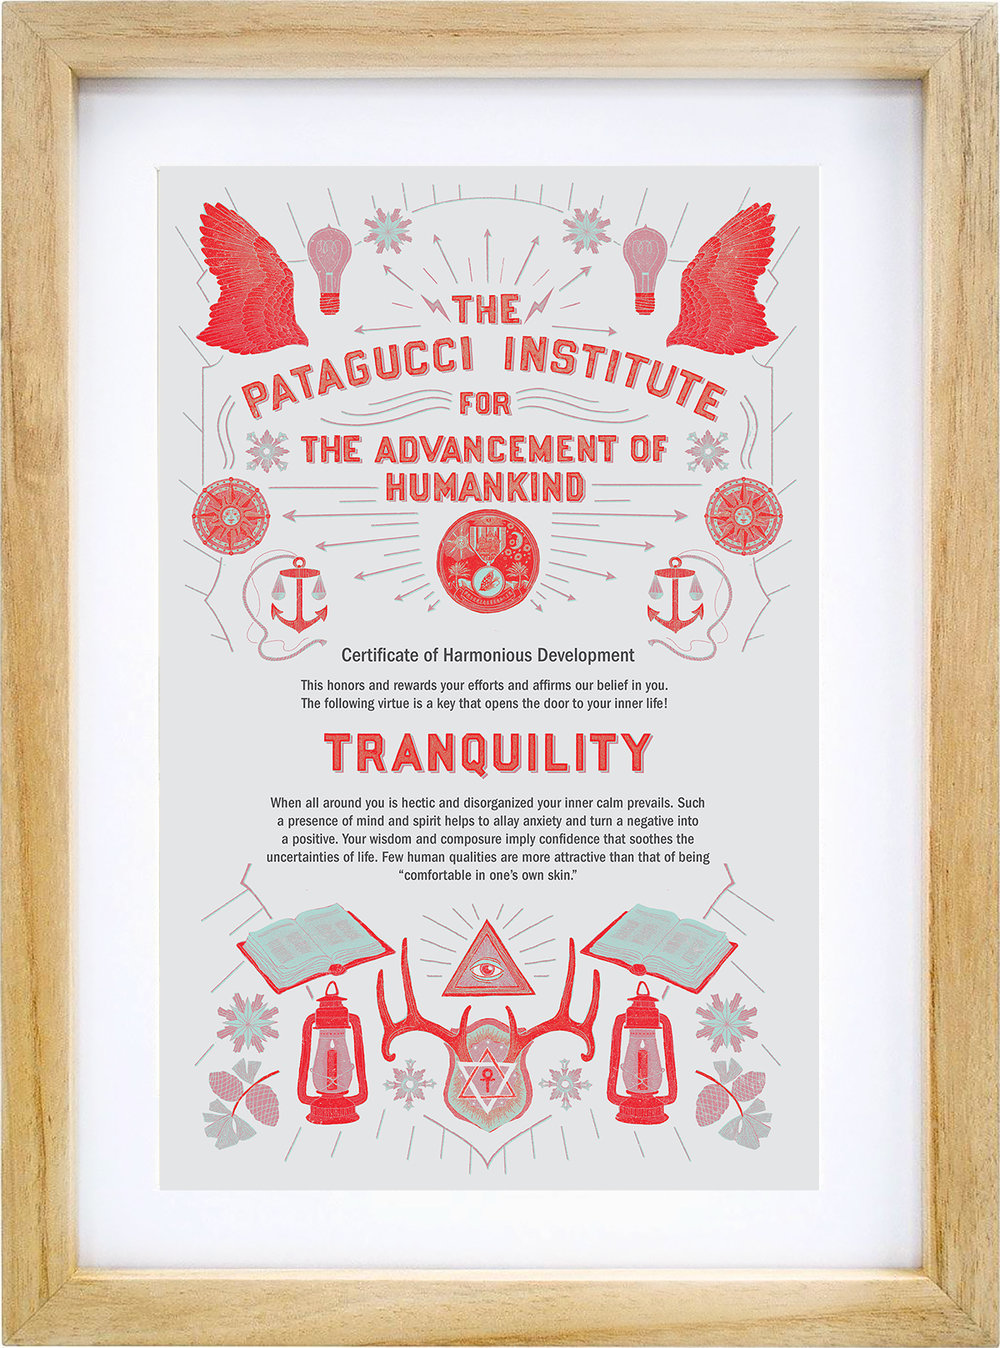 _tranquility_Illuminati_standard_rouge_12.jpg